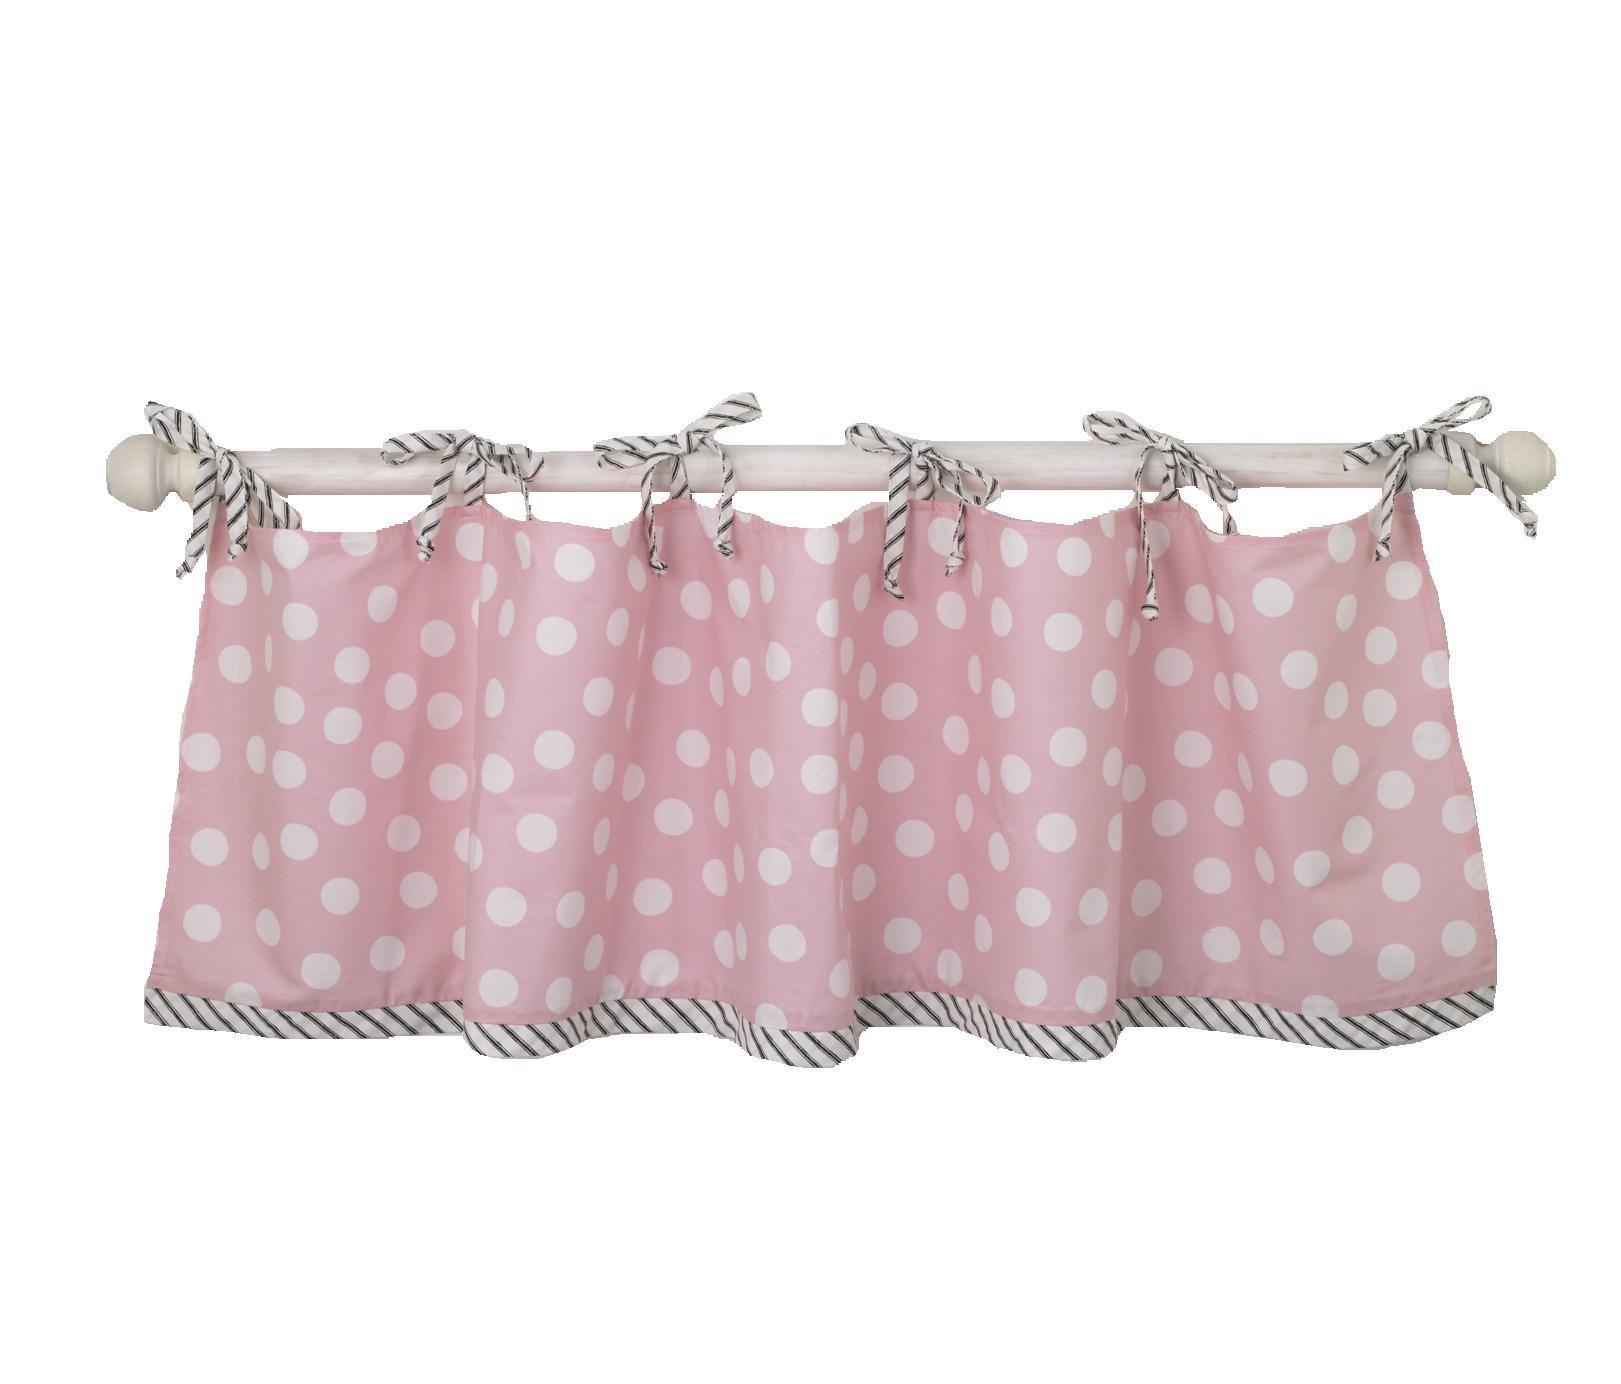 Cotton Tale Designs Poppy Valance by Cotton Tale Designs